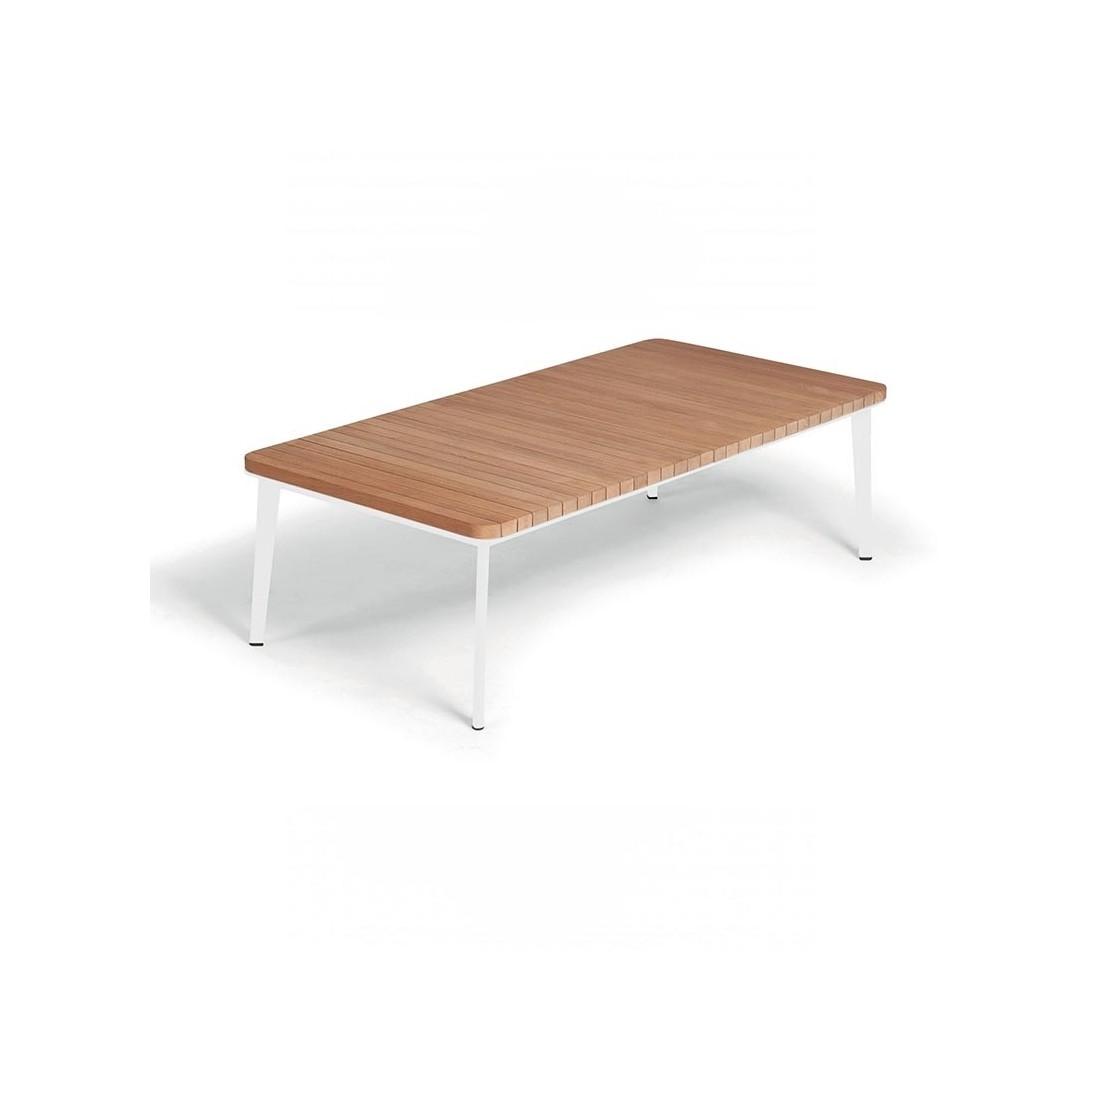 table basse rectangulaire en teck et aluminium. Black Bedroom Furniture Sets. Home Design Ideas